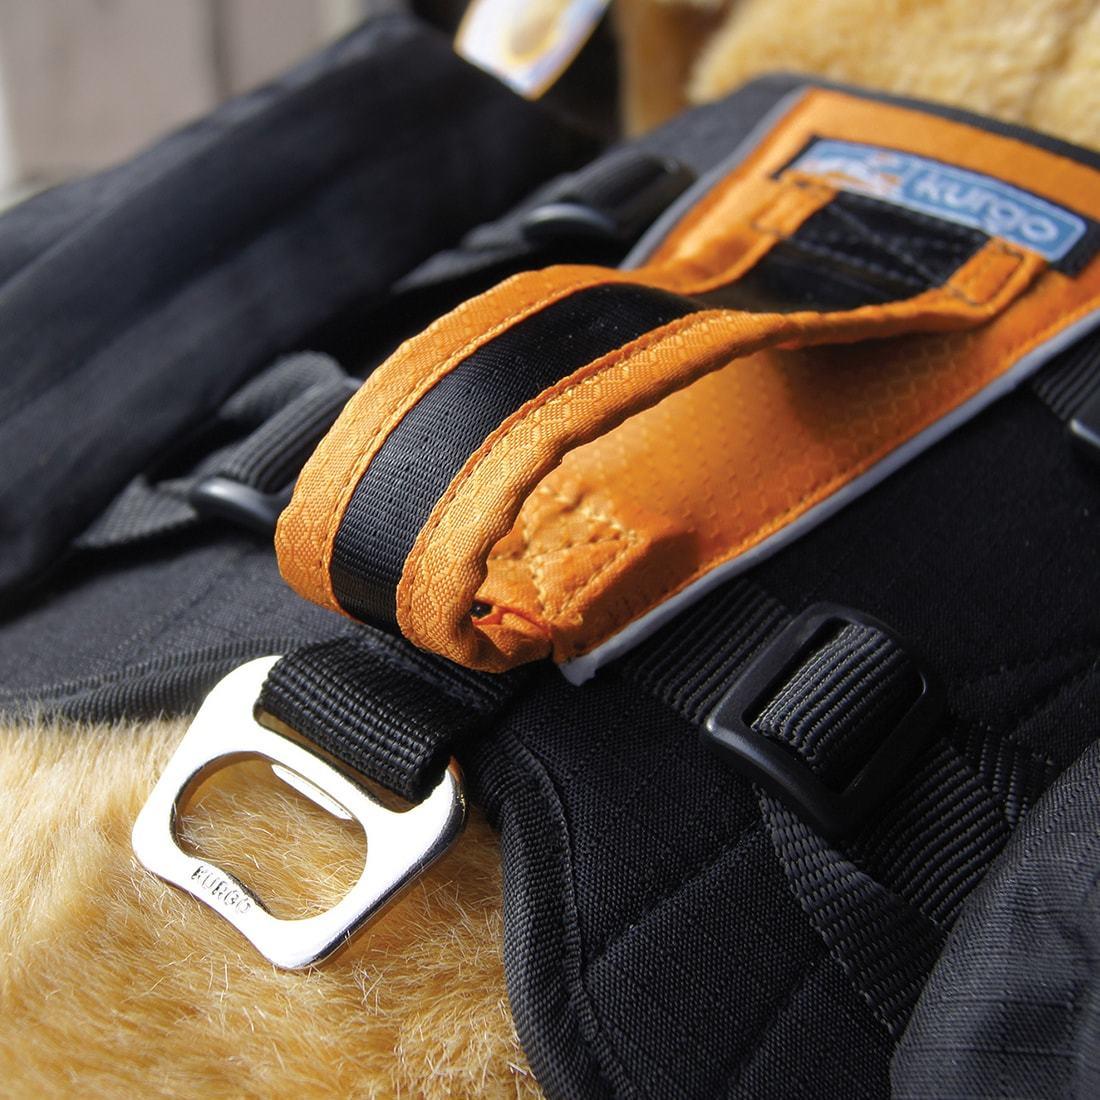 Dog_Backpack_Kurgo_Dog_Backpack_Buckle__95071.1485380335.1280.1280